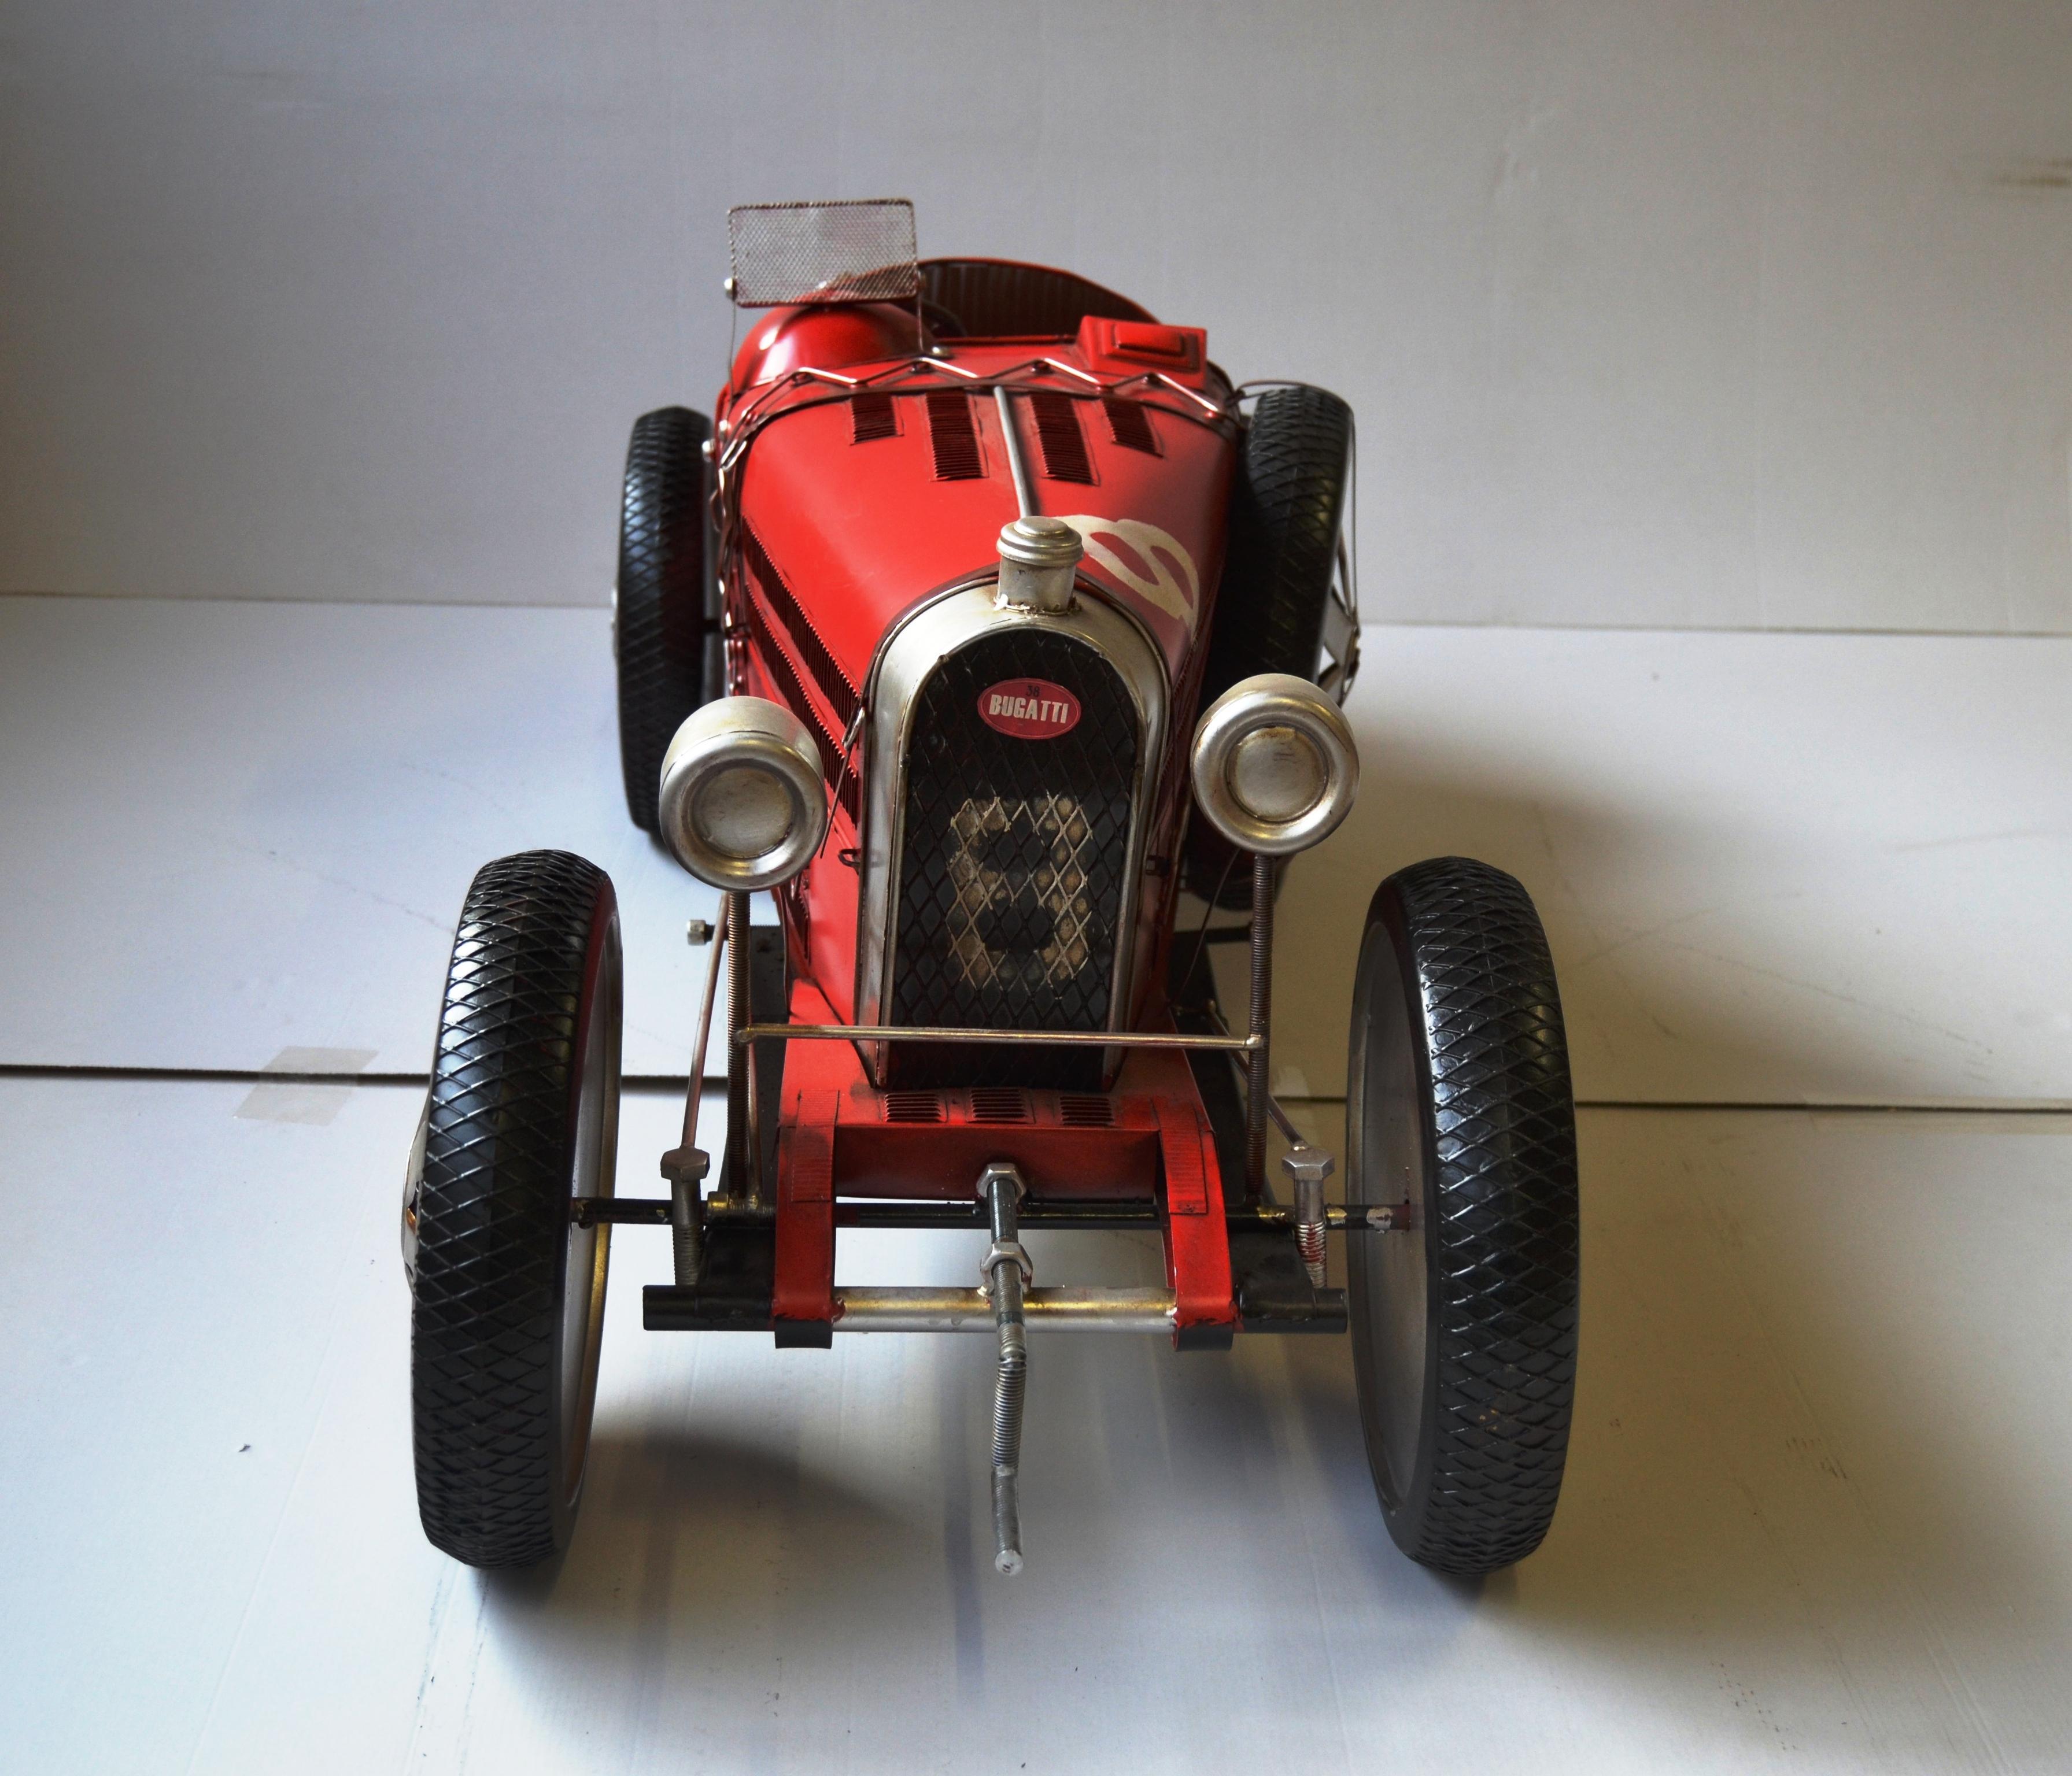 gro modell aus blech bugatti oldtimer modell t 35 c gro es. Black Bedroom Furniture Sets. Home Design Ideas